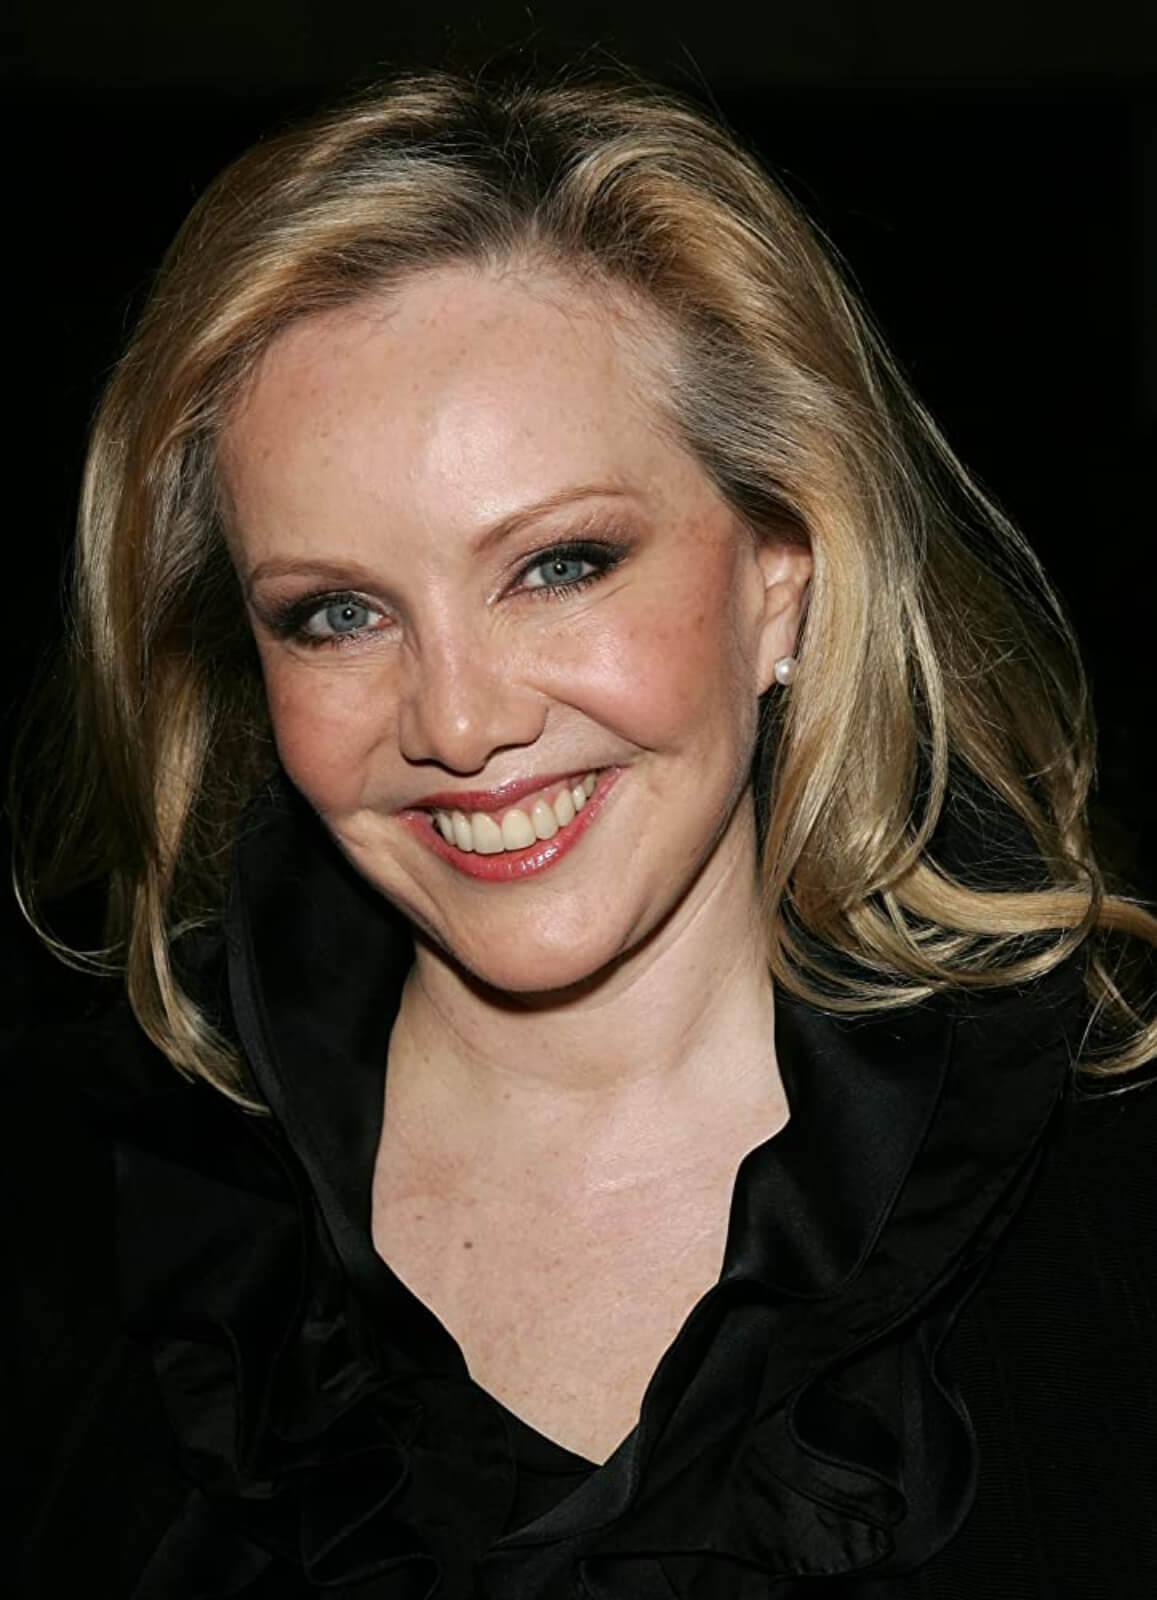 Headshot of Susan Stroman, dressed in black.